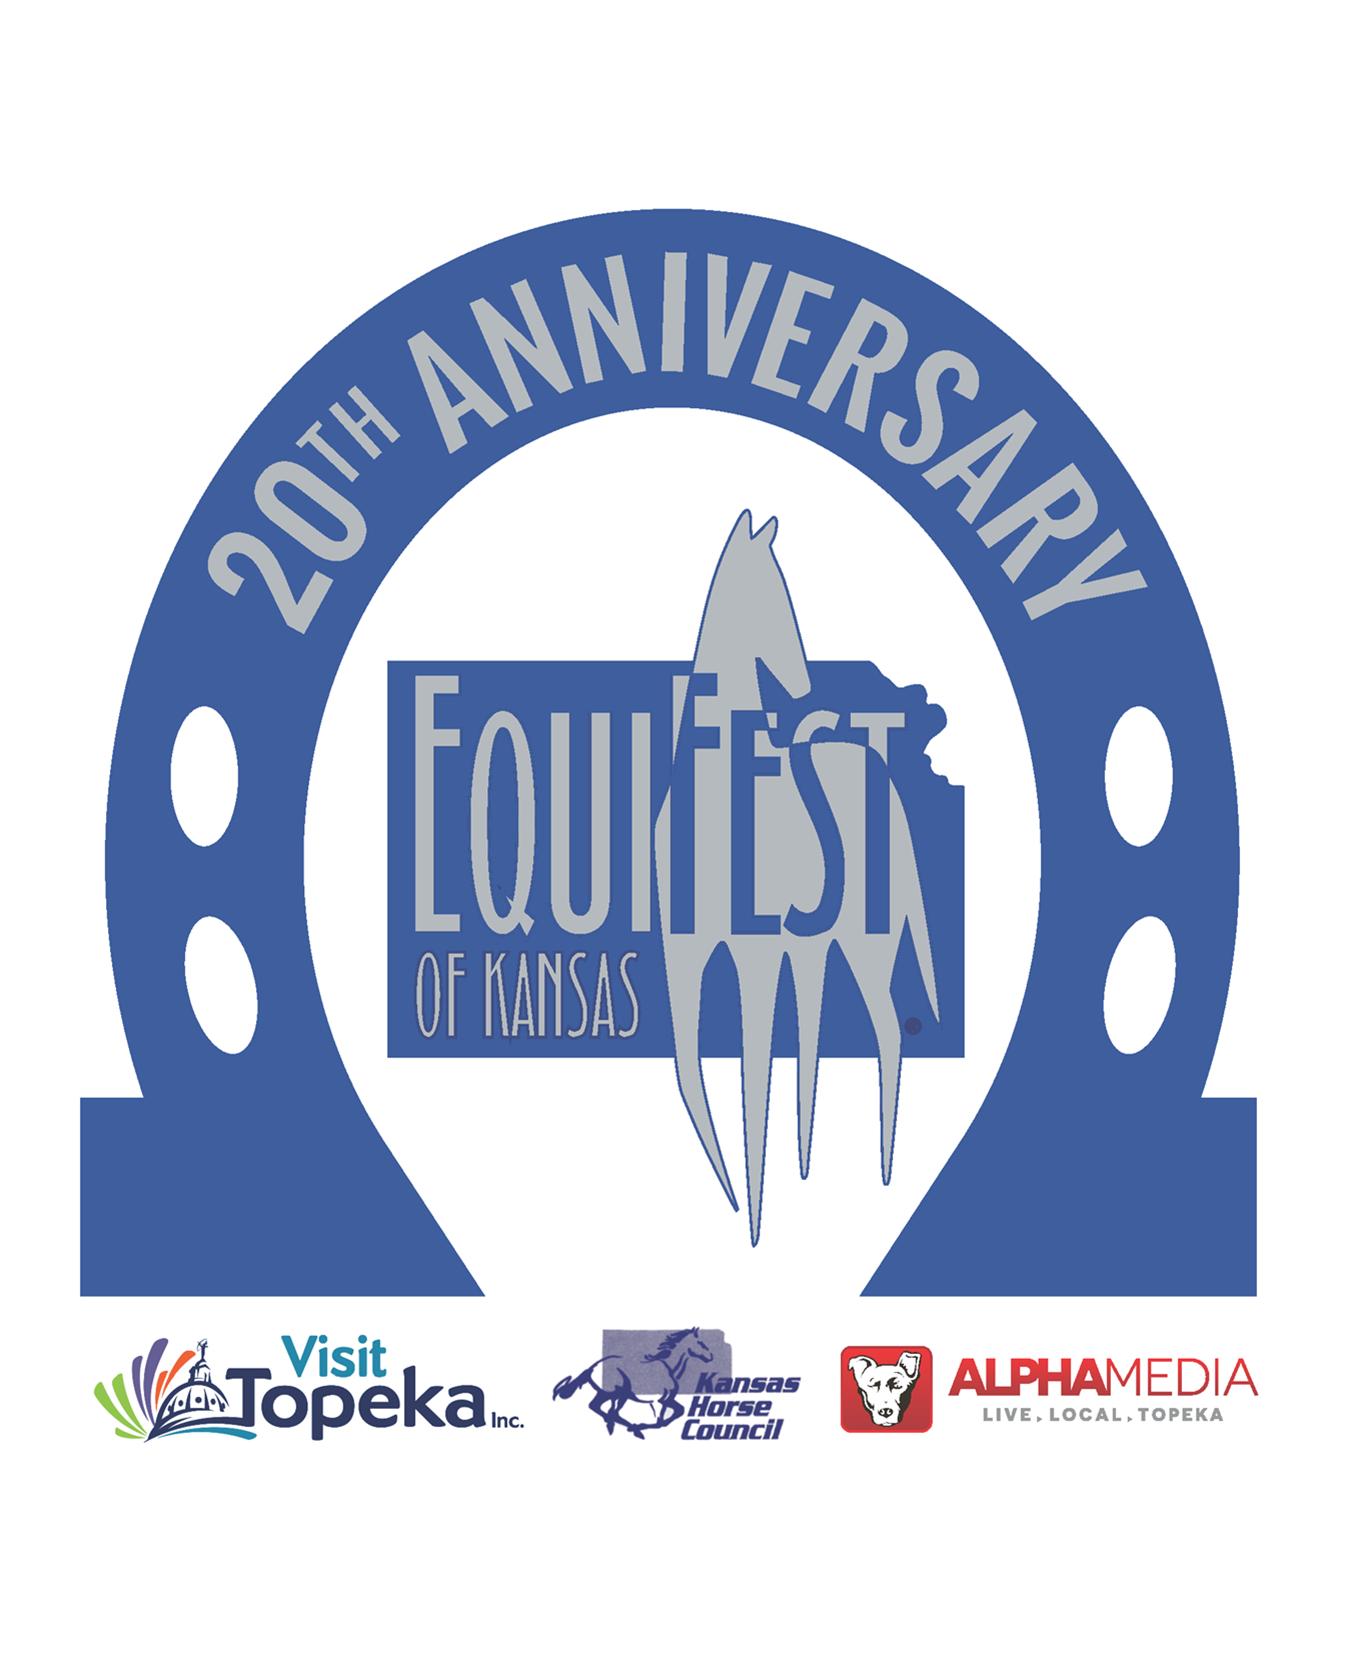 Equifest of Kansas